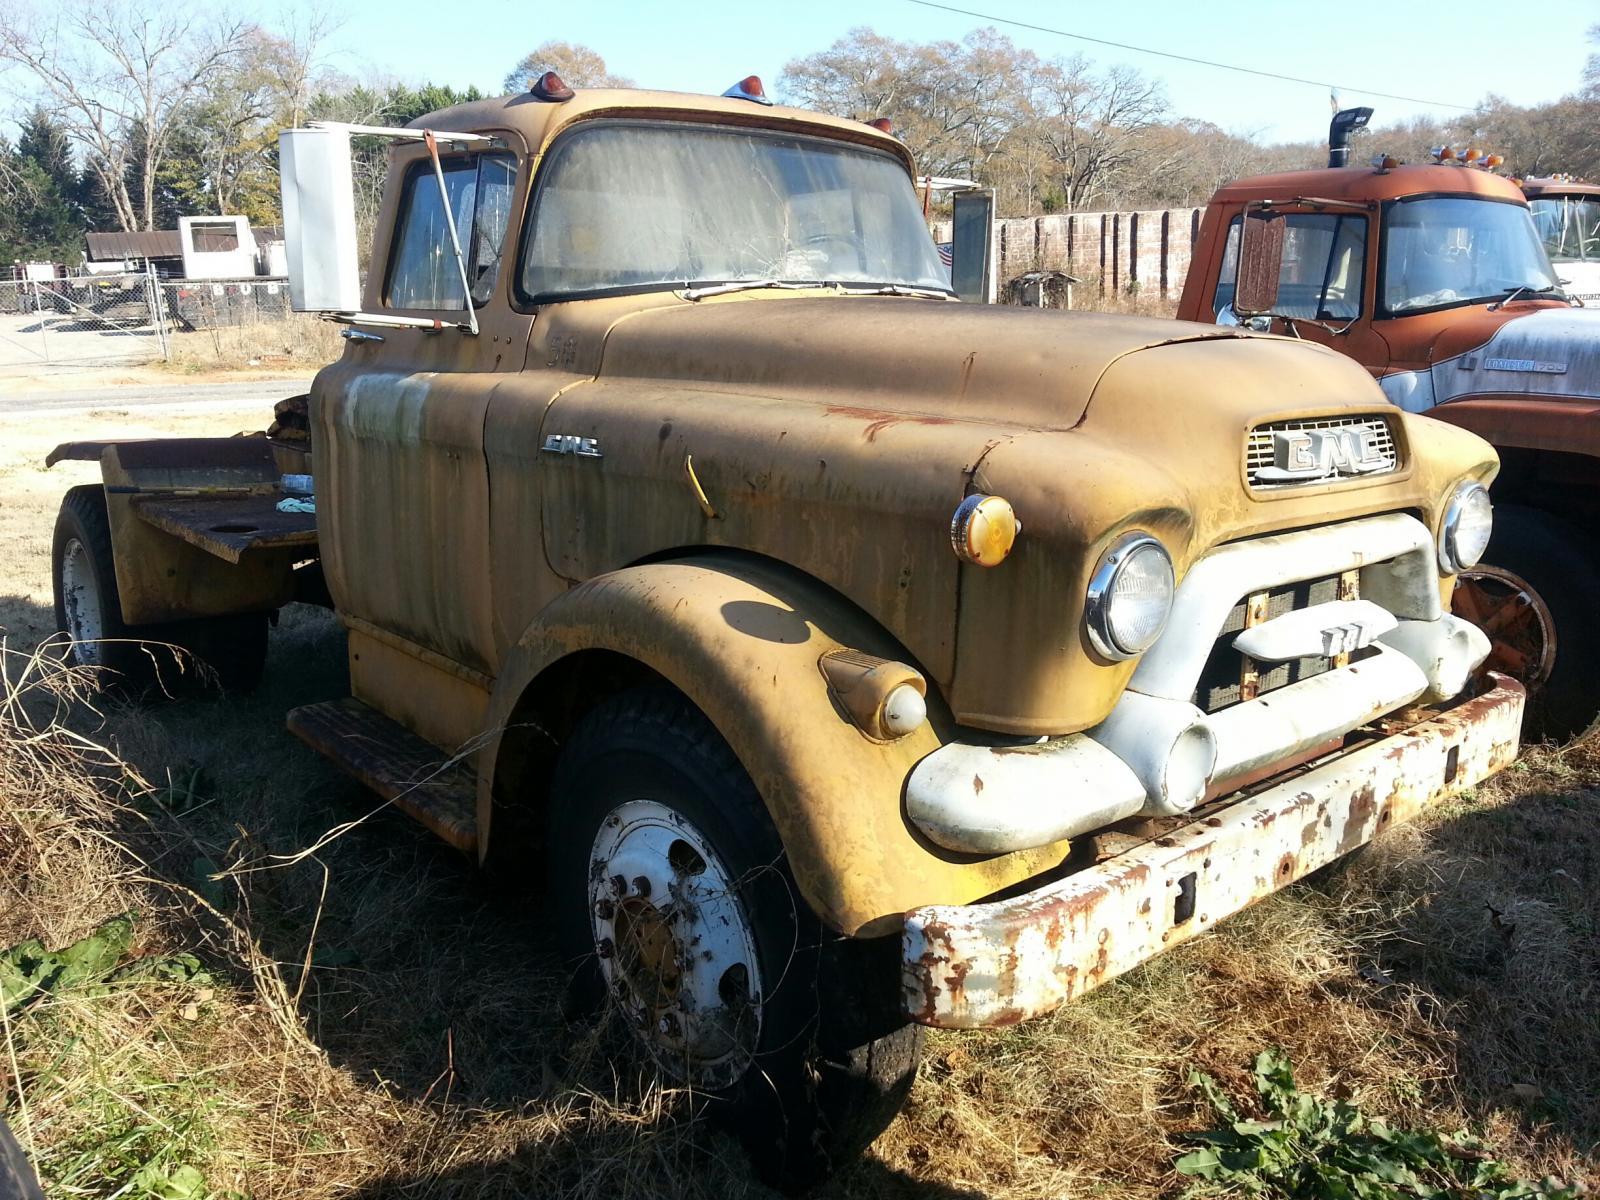 Trucks For Sale: Few Old Trucks For Sale!